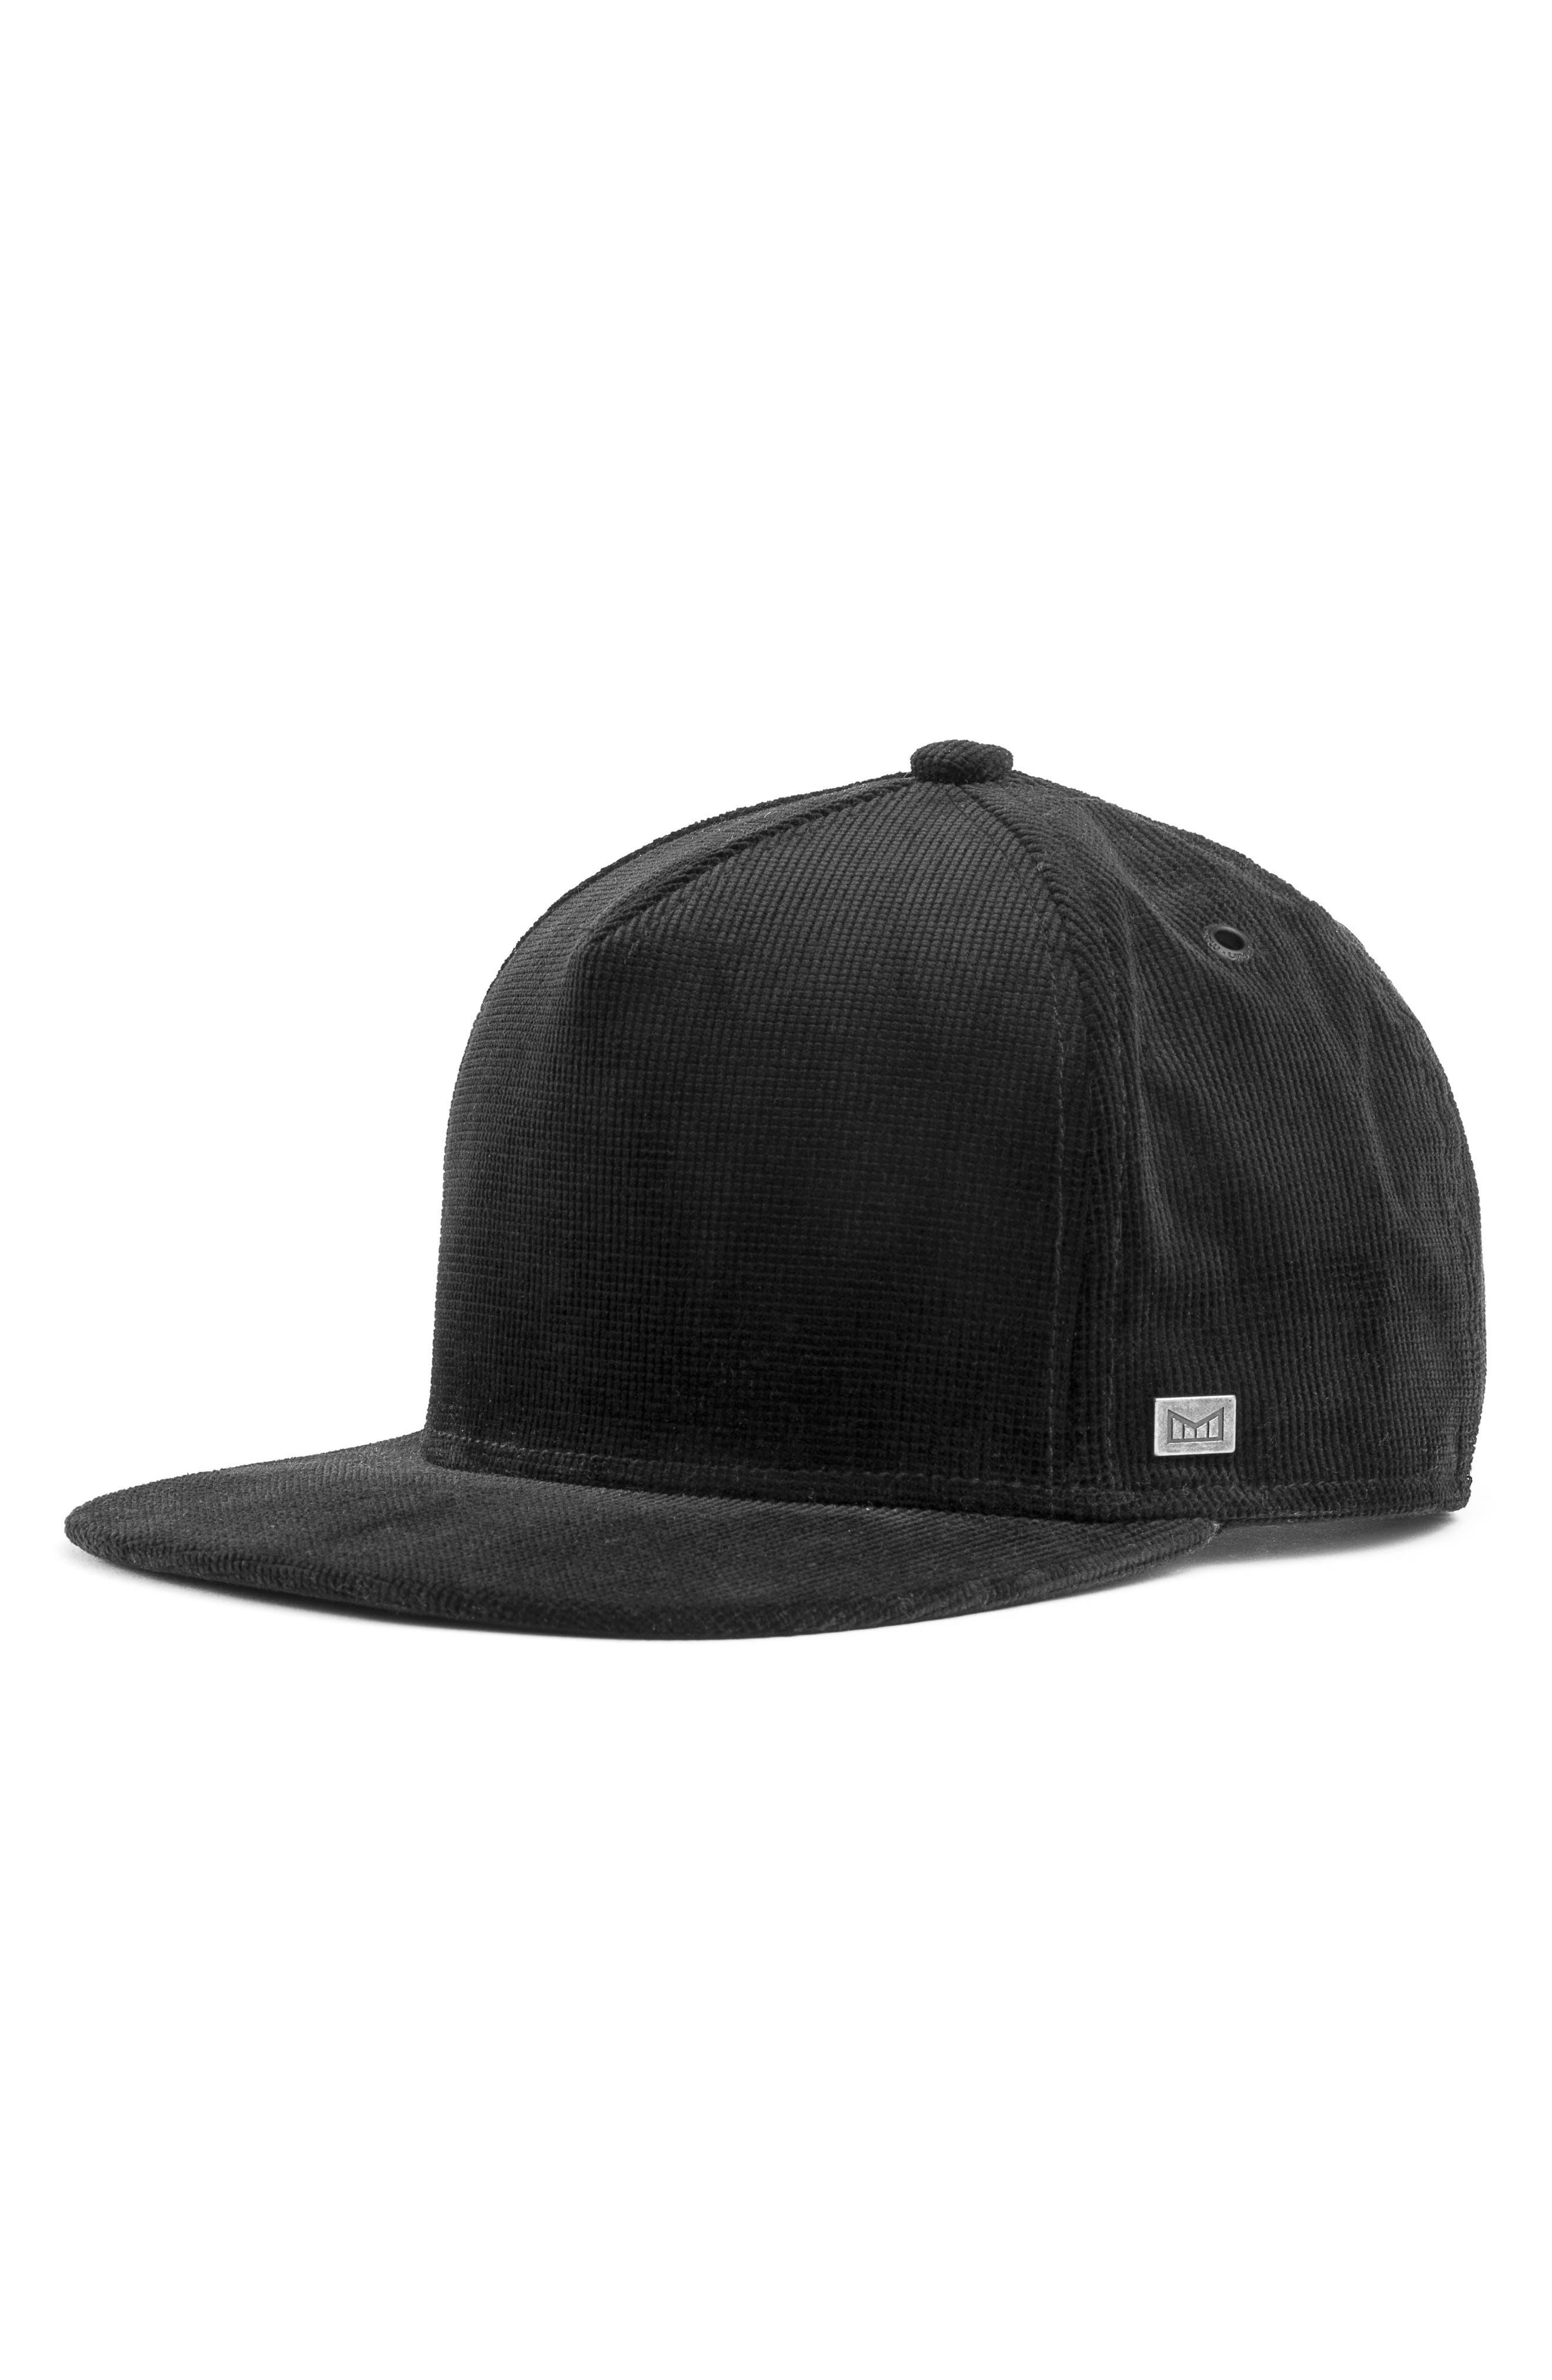 Main Image - Melin The Stealth Snapback Baseball Cap